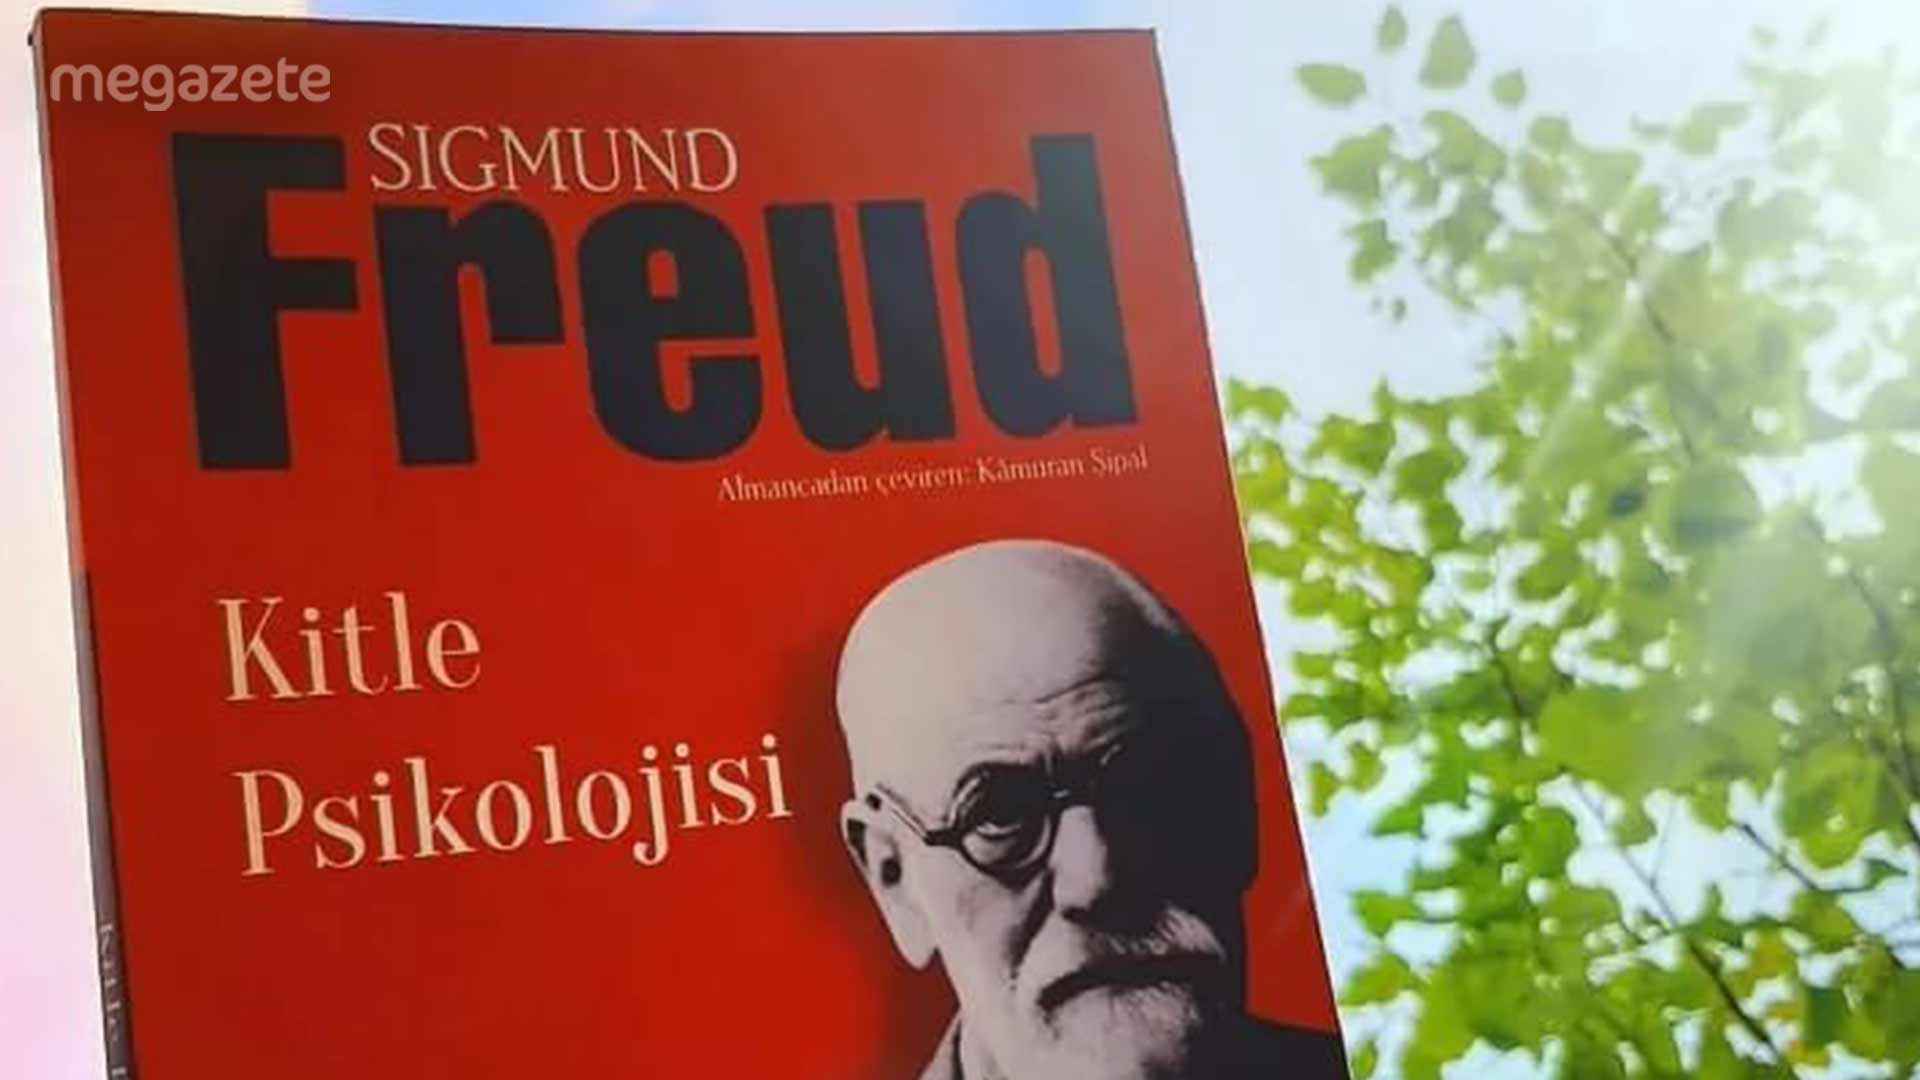 Kitle Psikolojisi – Sigmund Freud